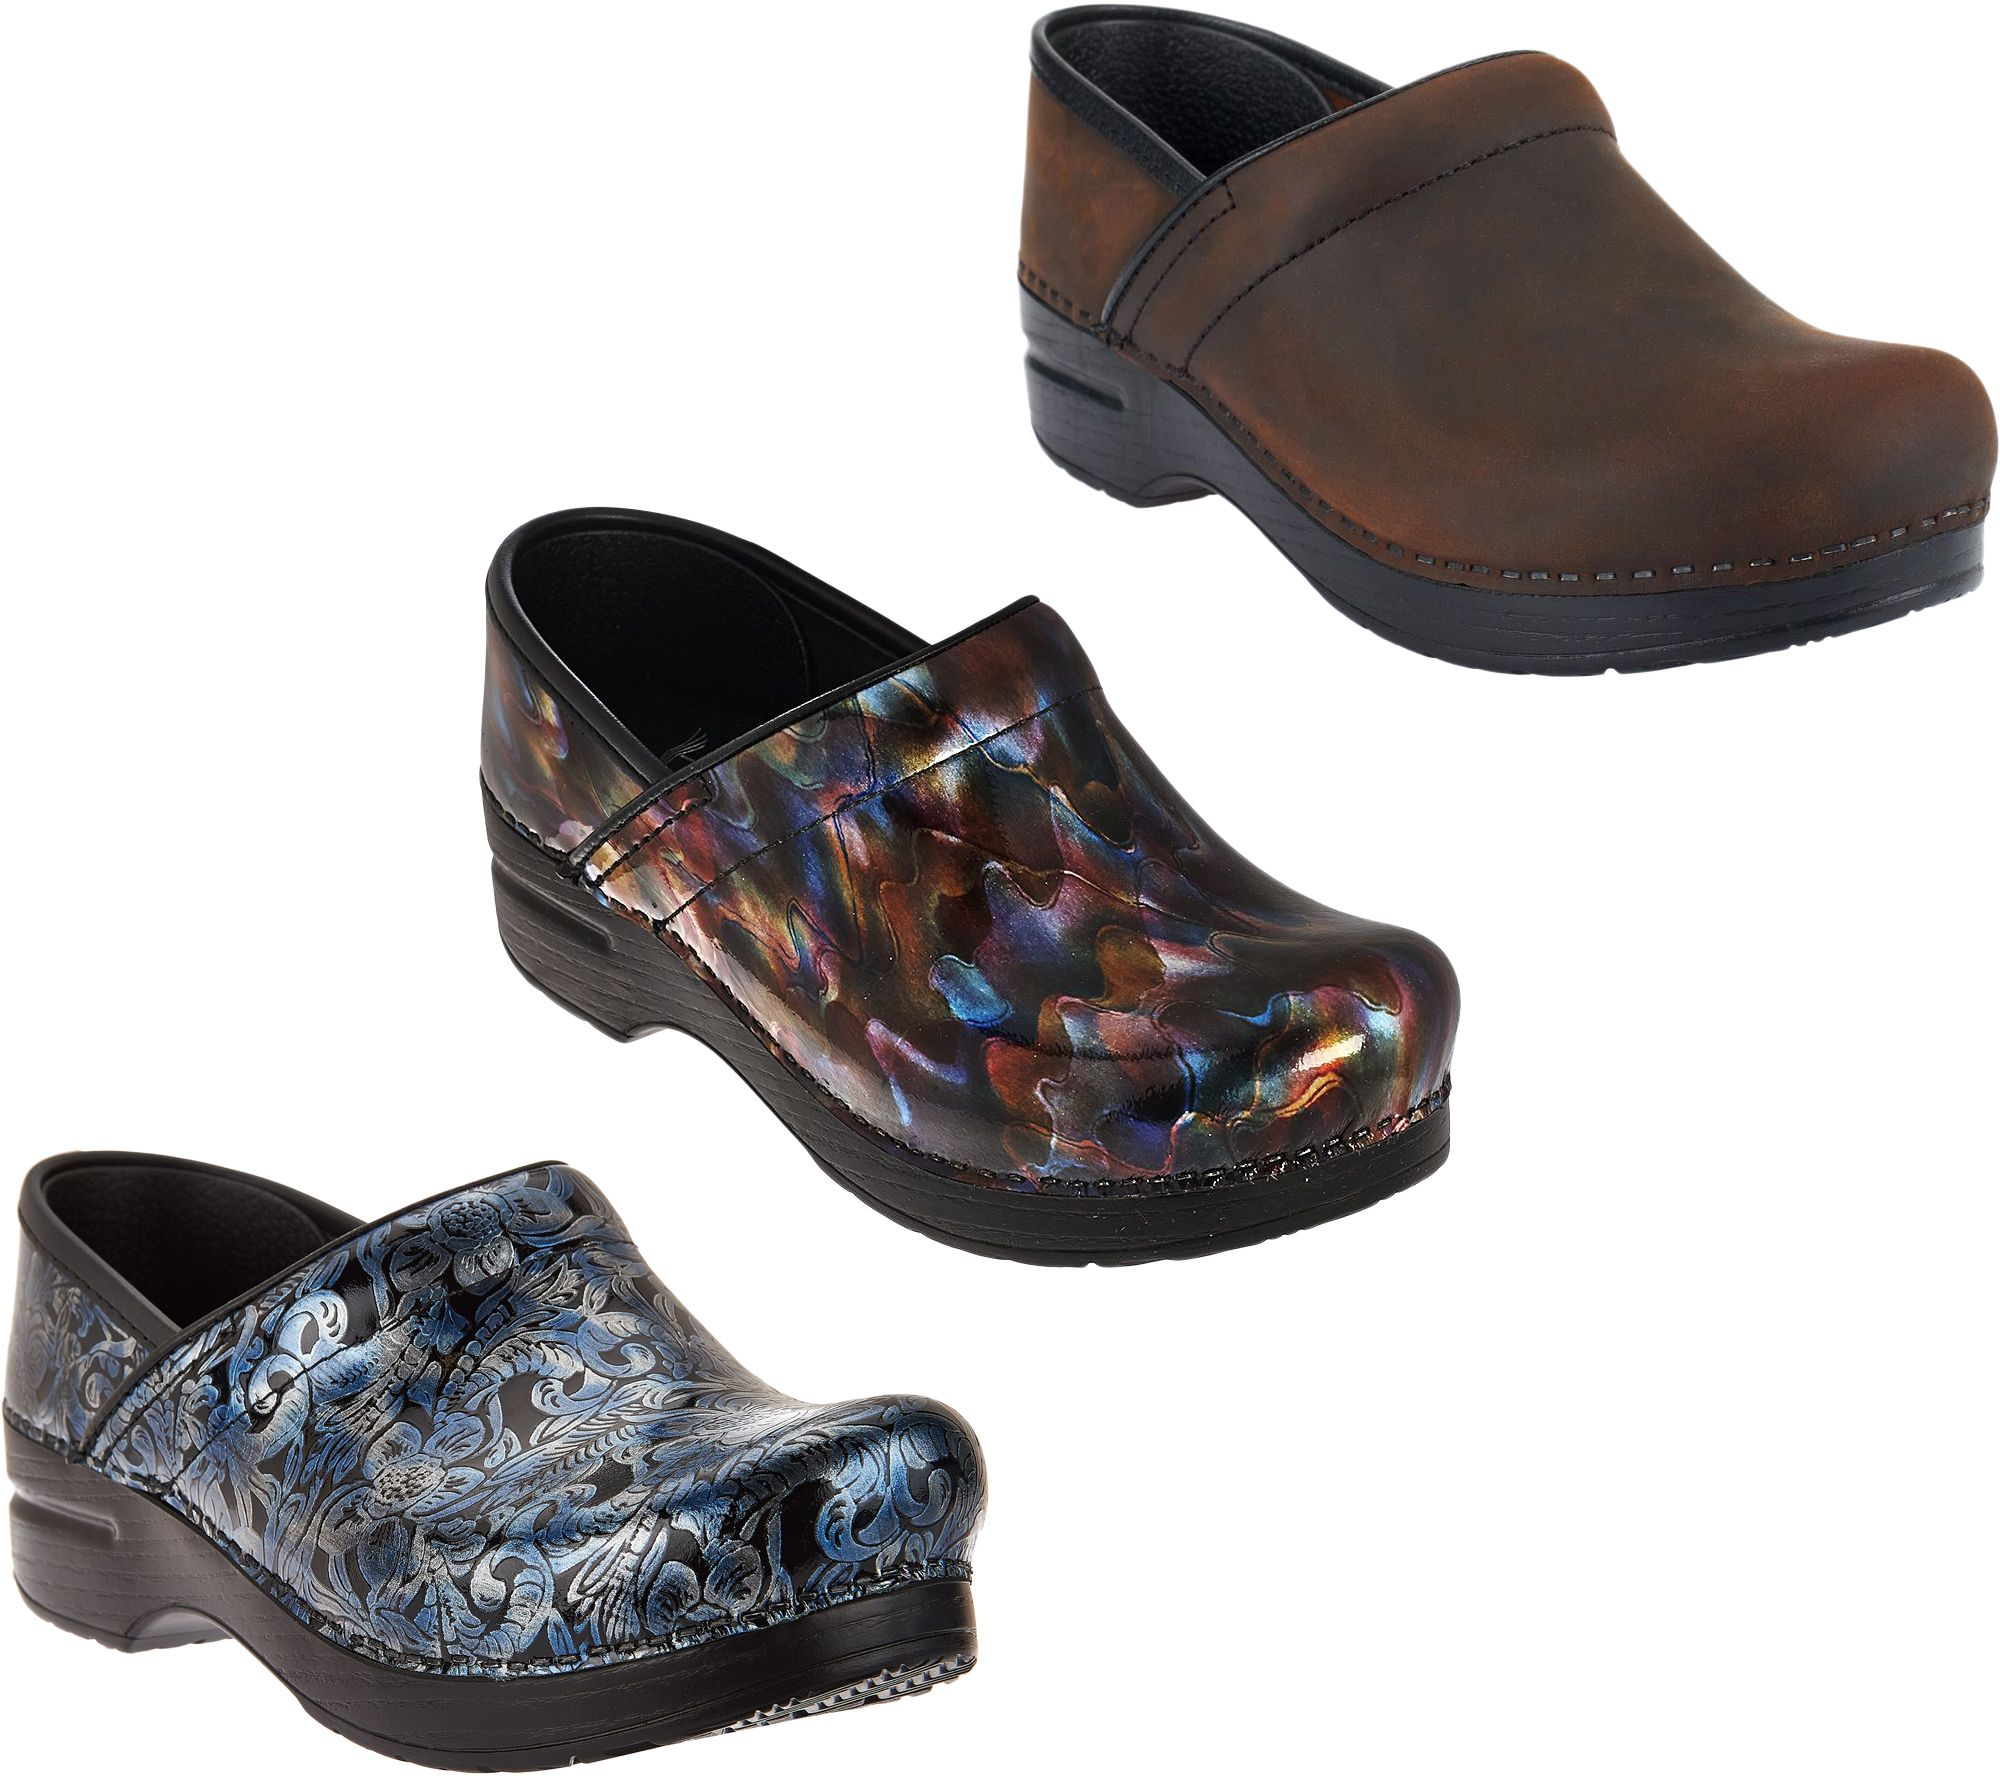 Dansko Professional Leather Slip On Clogs